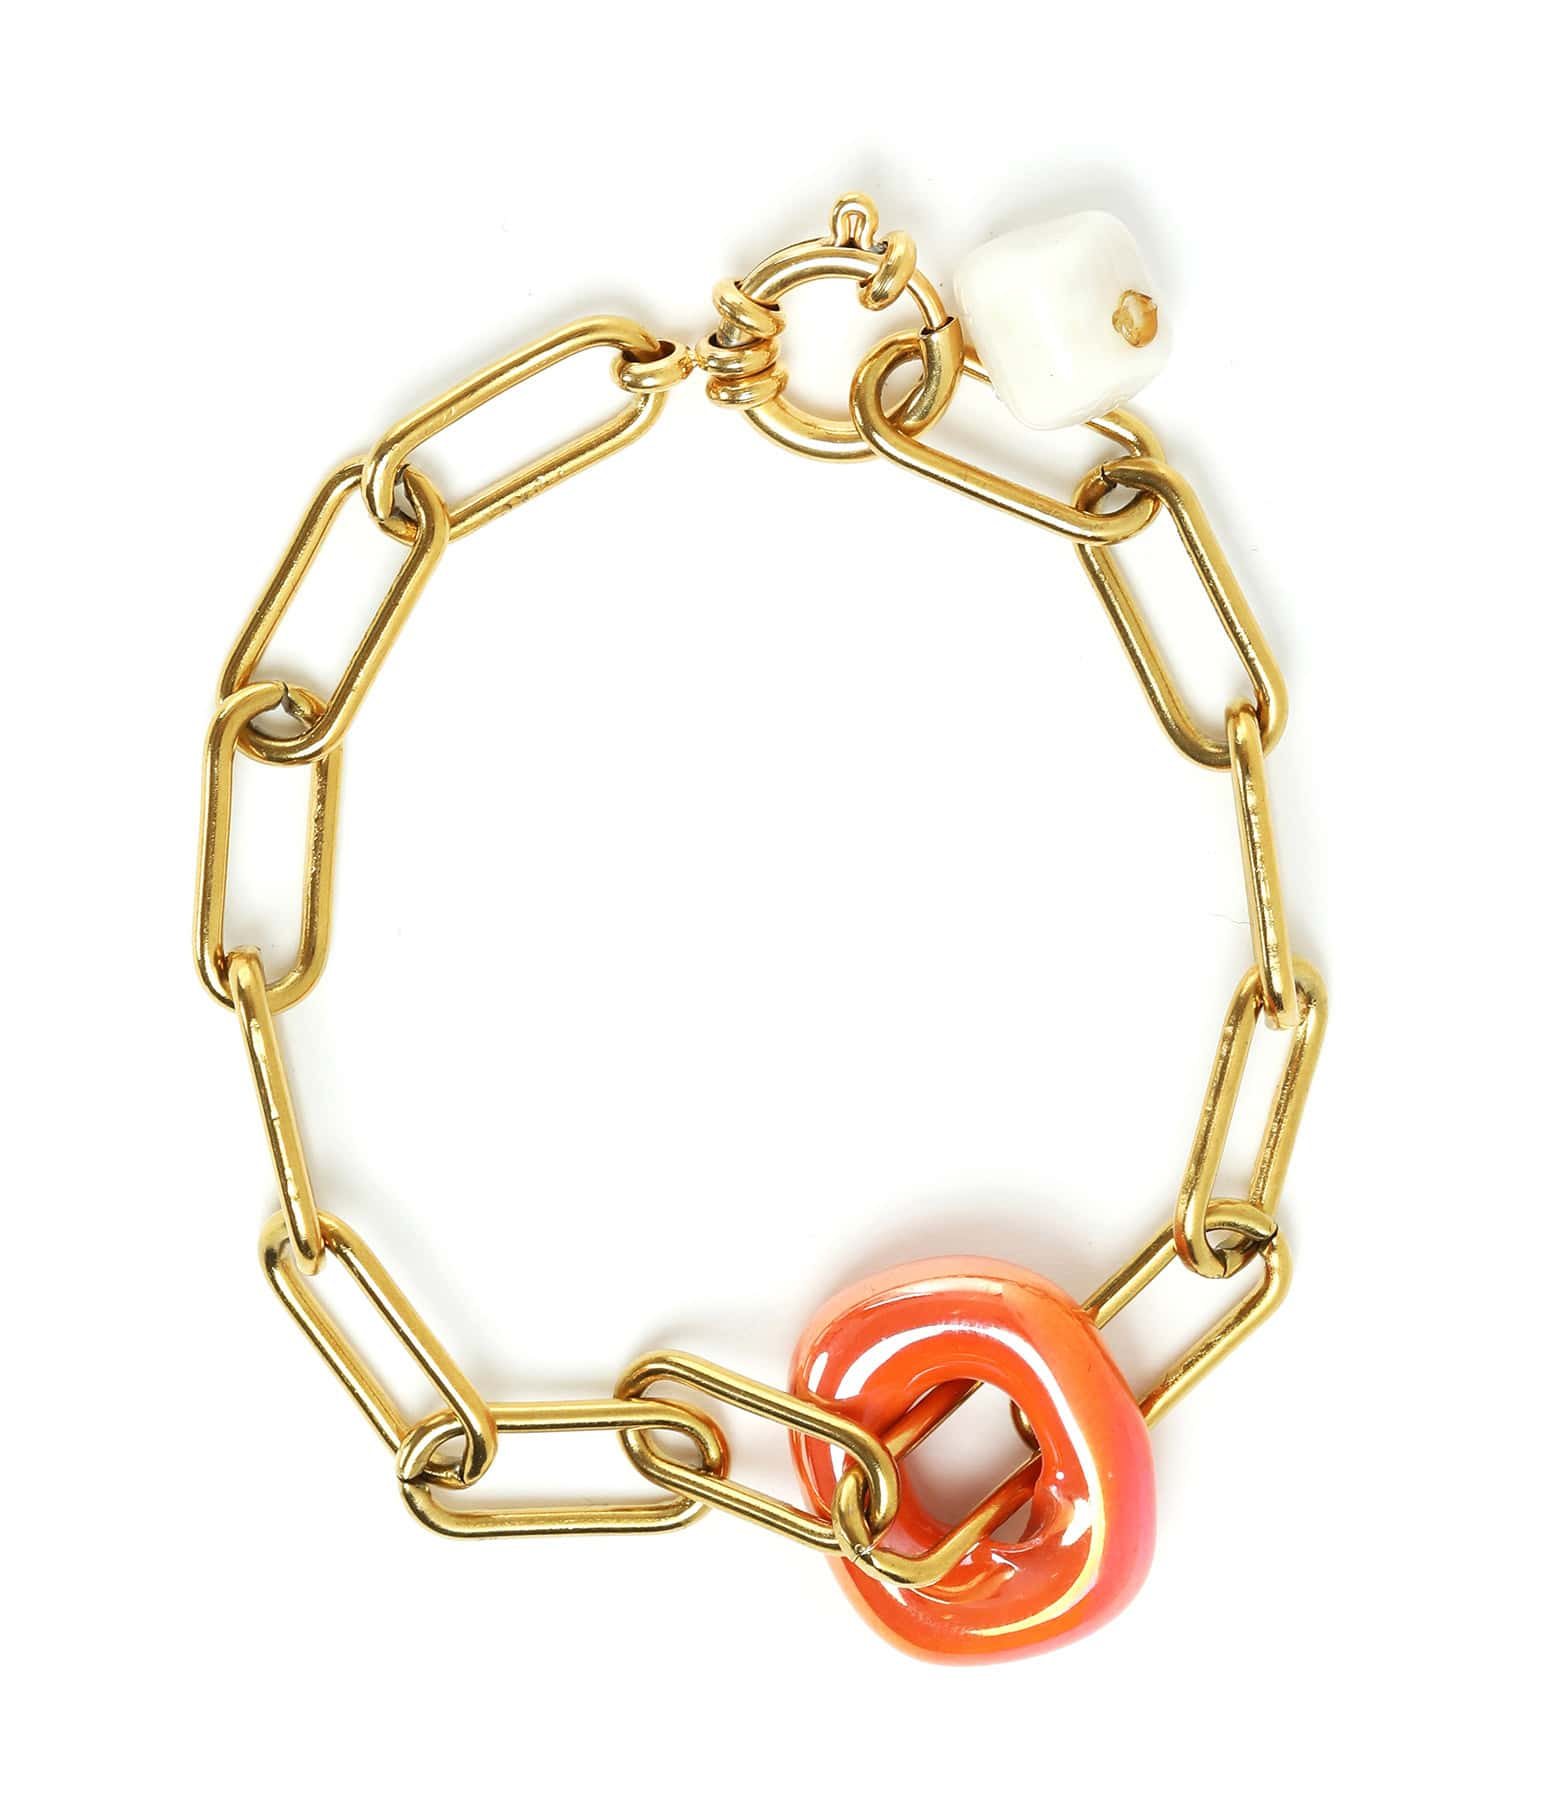 SHAKER JEWELS - Bracelet Solo Plaqué Or